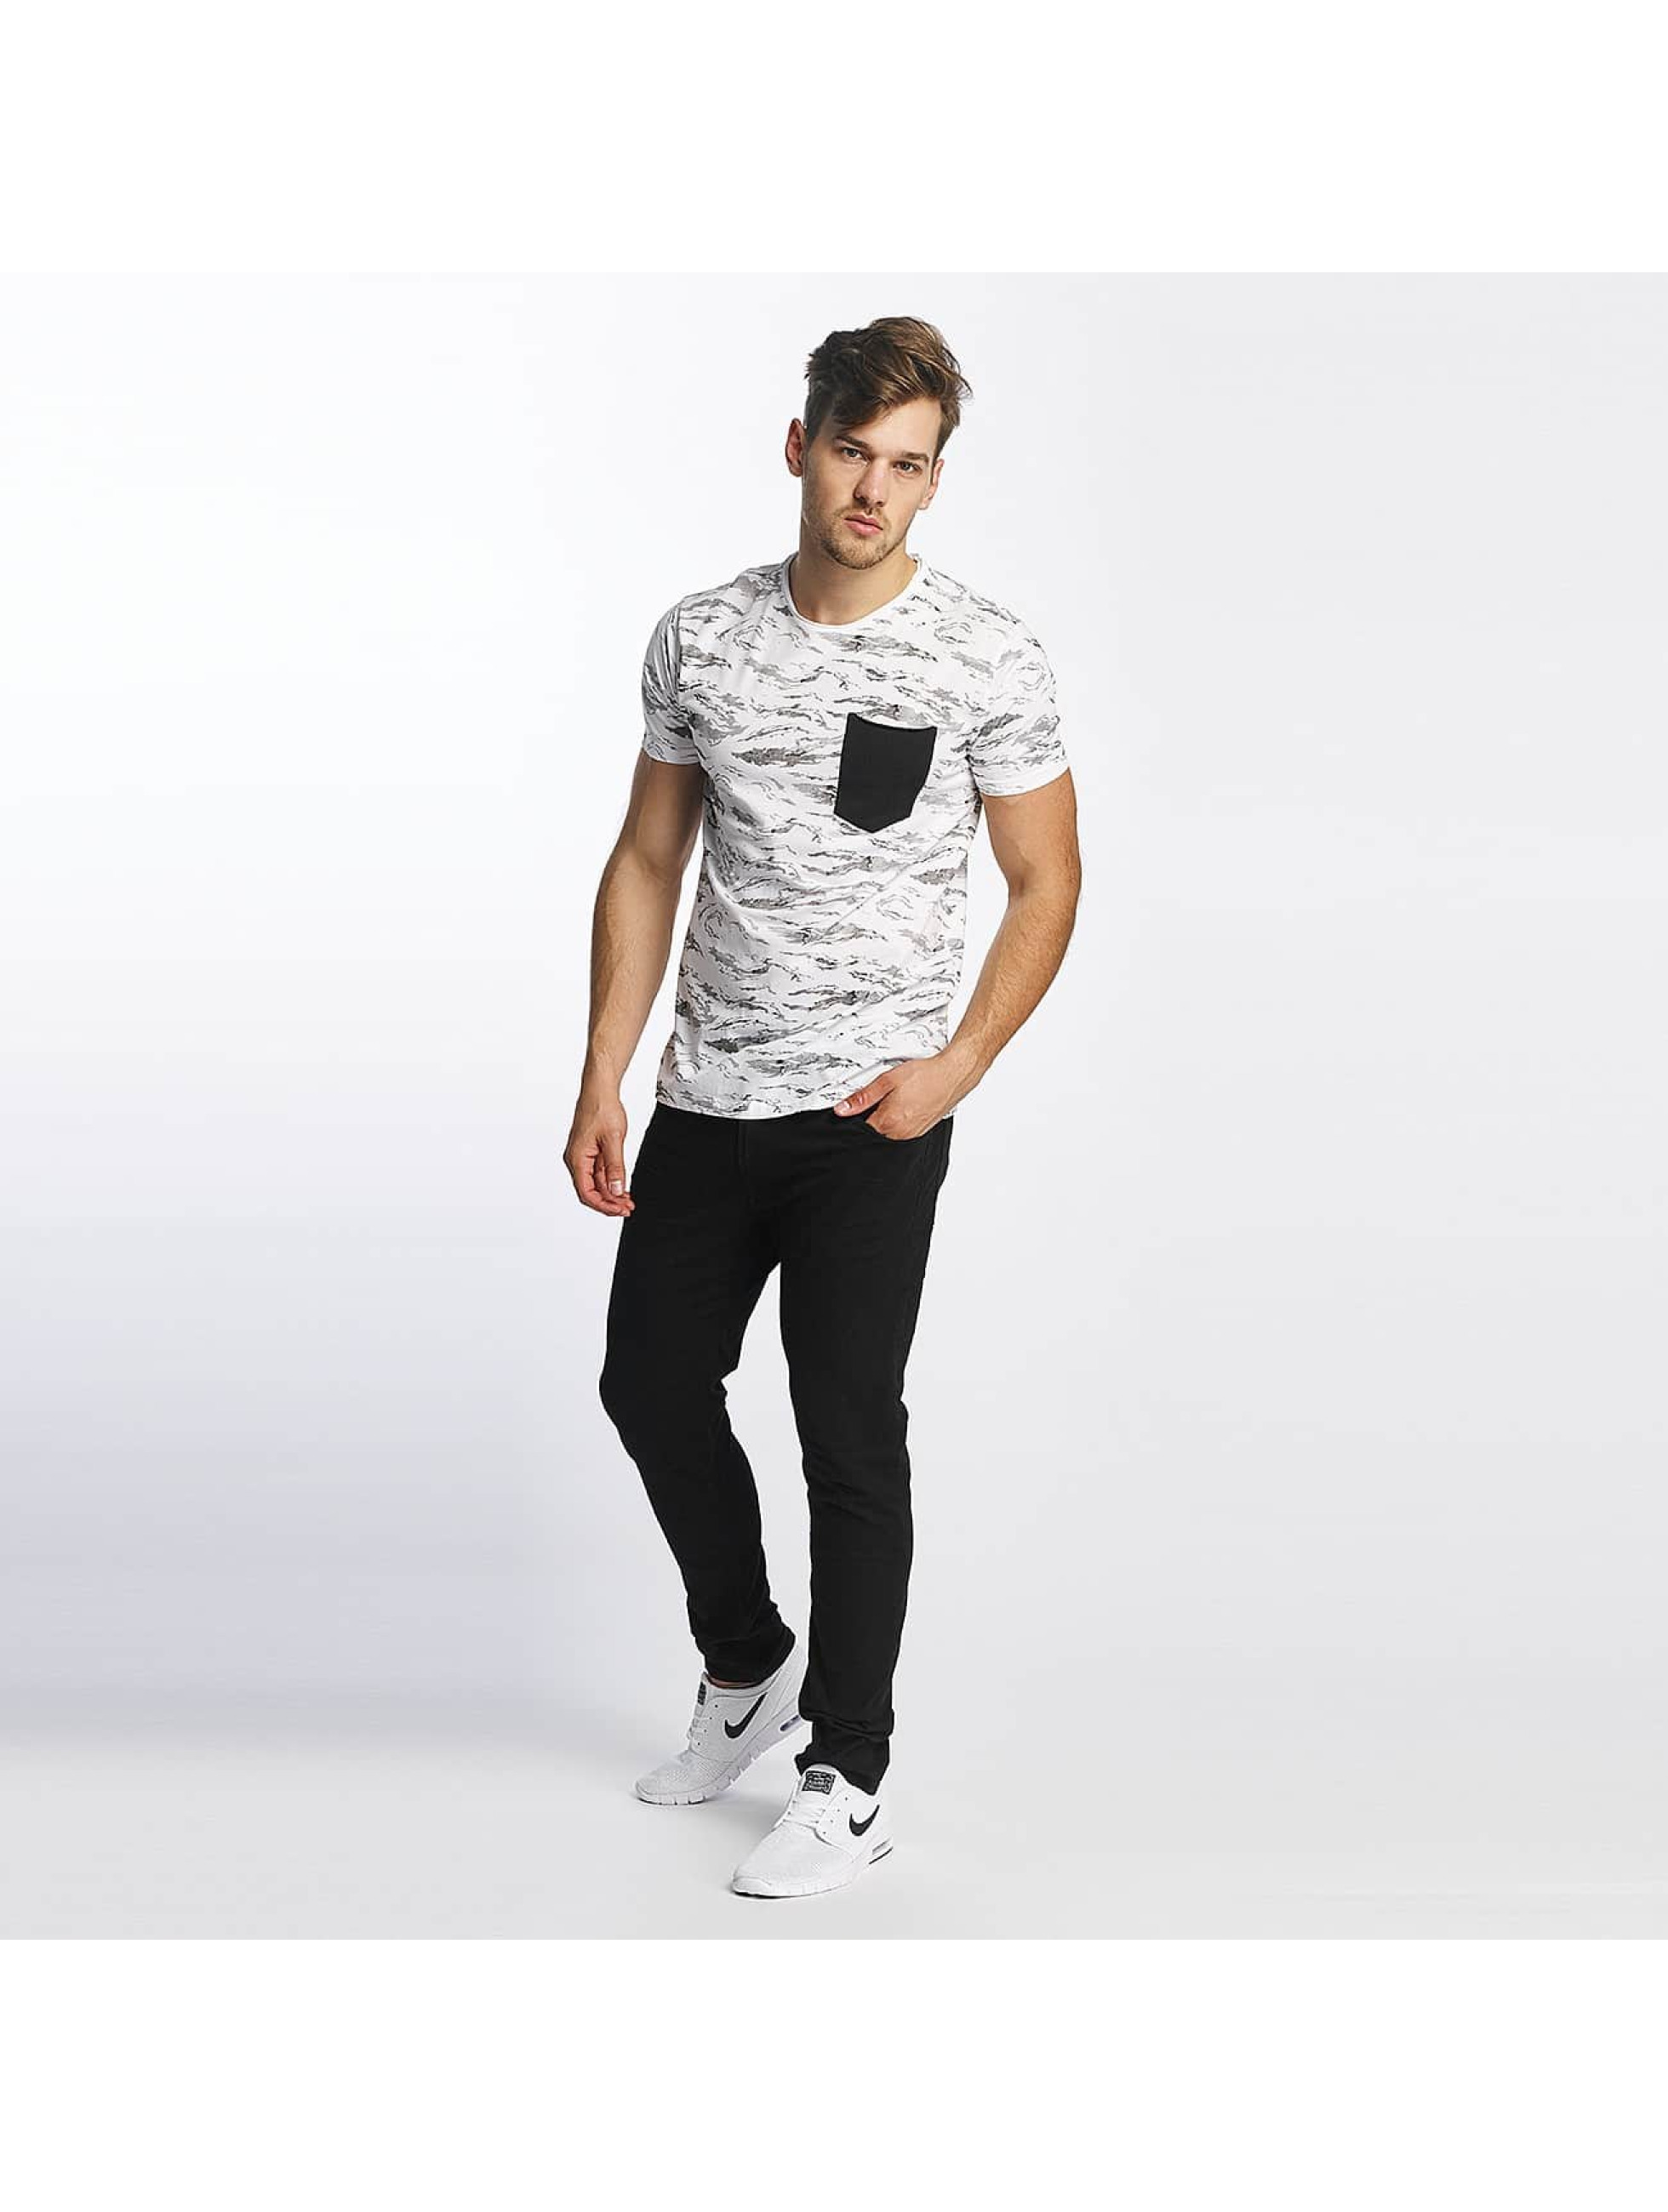 SHINE Original Camiseta All Over Print blanco